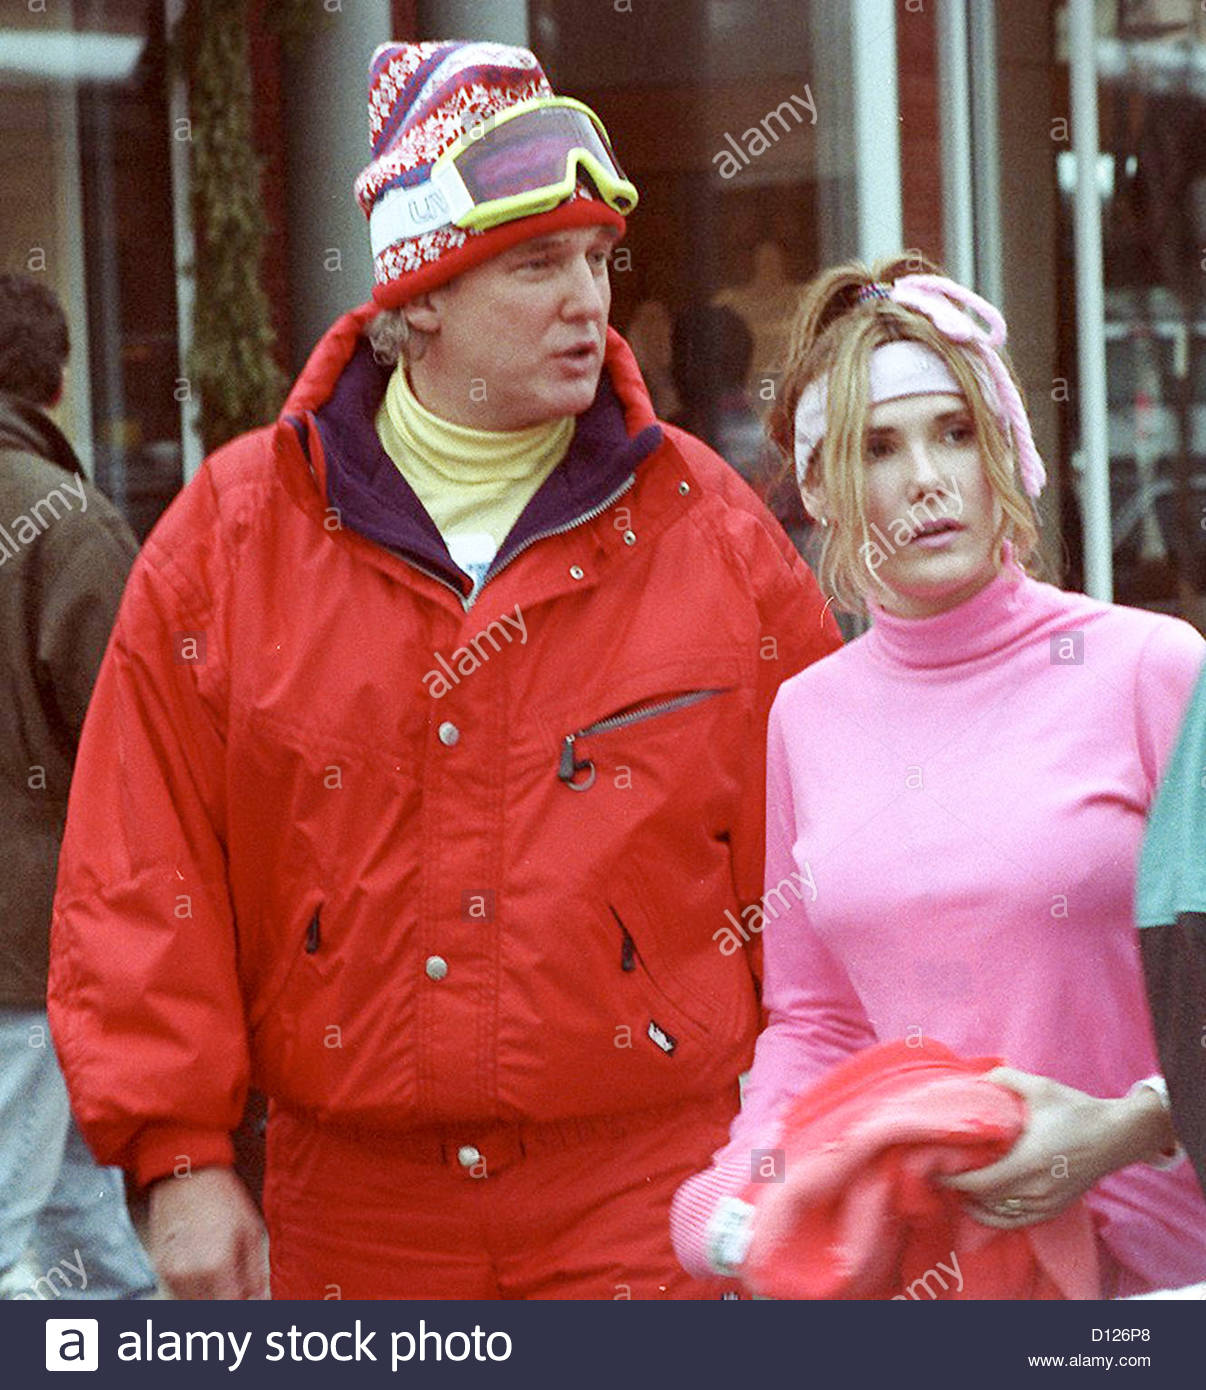 Donald Trump With Friend Kelly Skiing - Aspen Colorado USA 1990s Stock ...